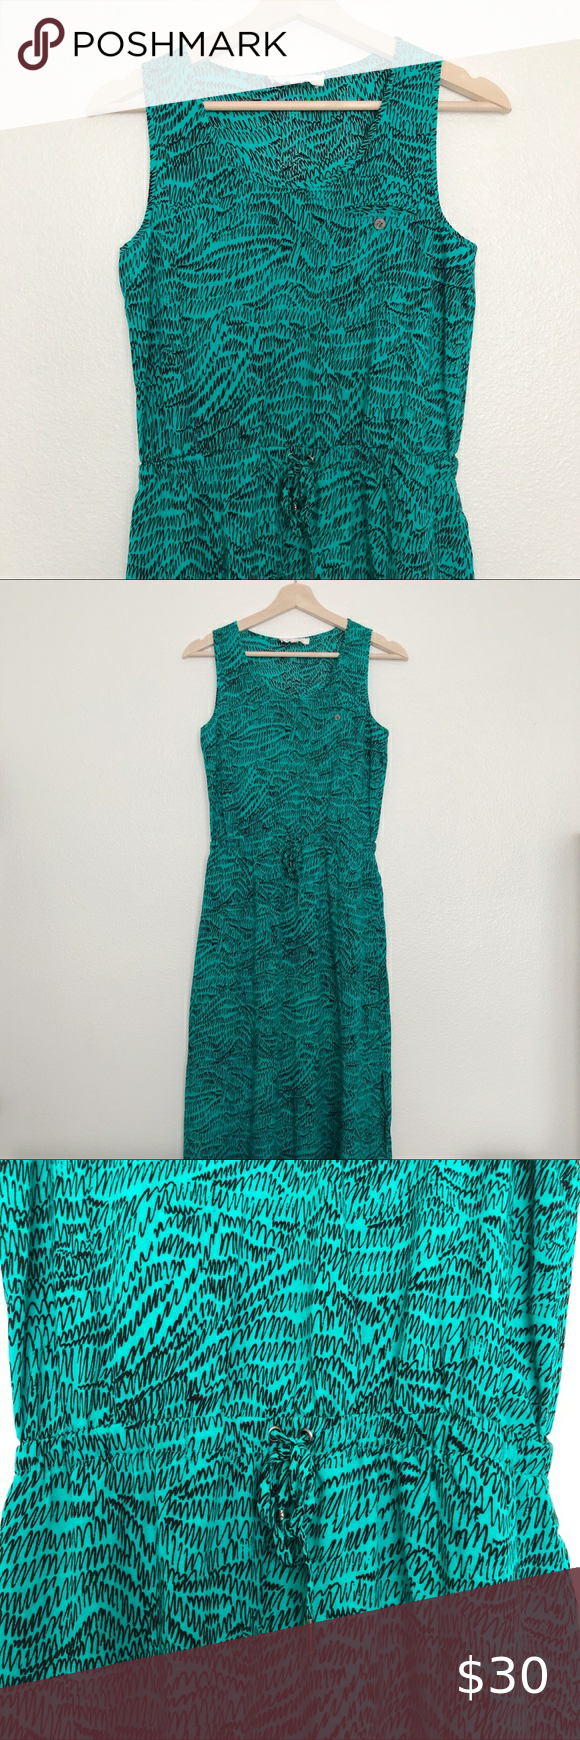 Two By Vince Camuto Maxi Dress Maxi Dress Clothes Design Dresses [ 1740 x 580 Pixel ]